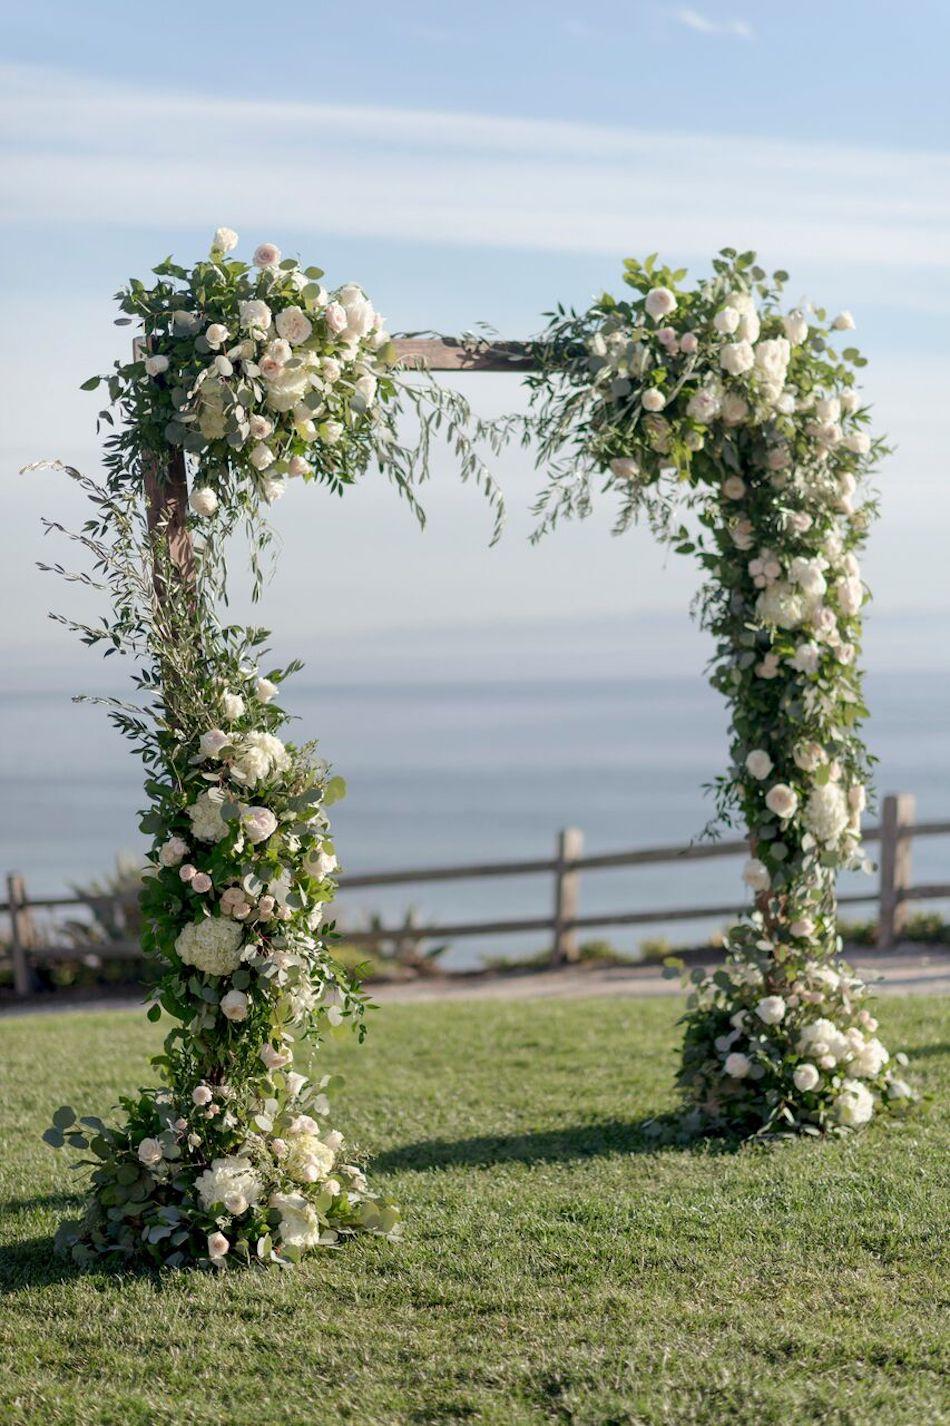 wedding arch, wedding flowers, white wedding, elegant white, wedding, ceremony, flowers by cina